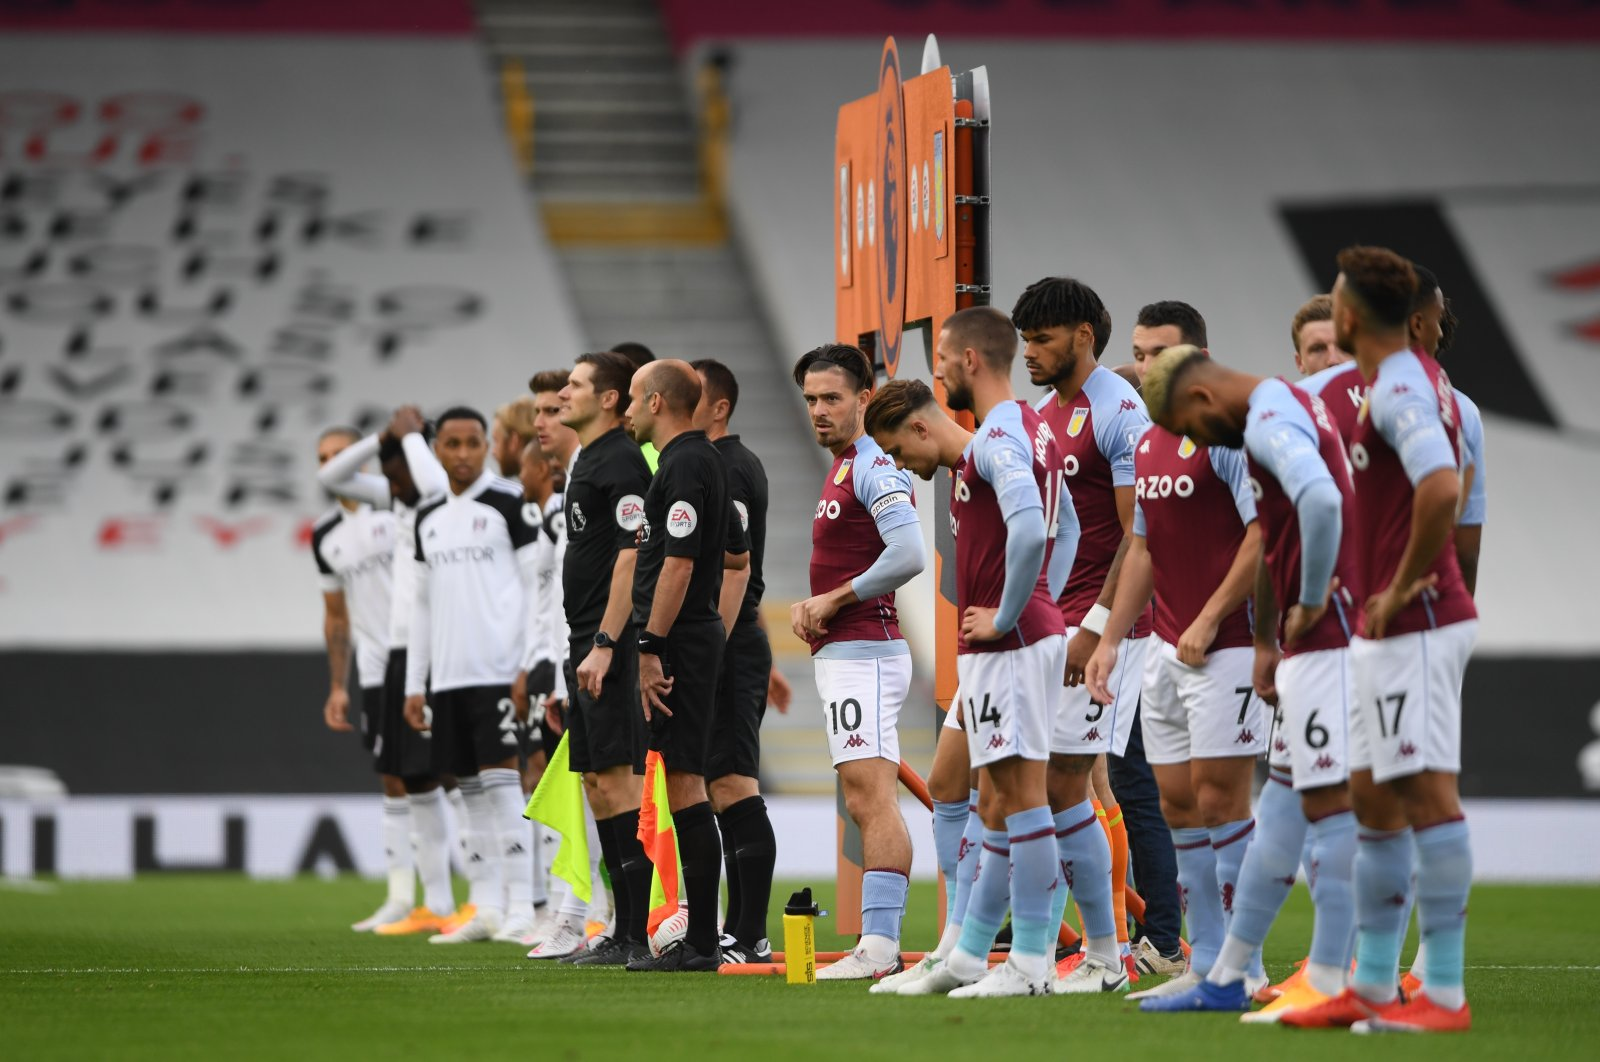 Teams line up before a Premier League match between Fulham and Aston Villa in Craven Cottage, London, Britain, Sept. 28, 2020. (Pool via Reuters)